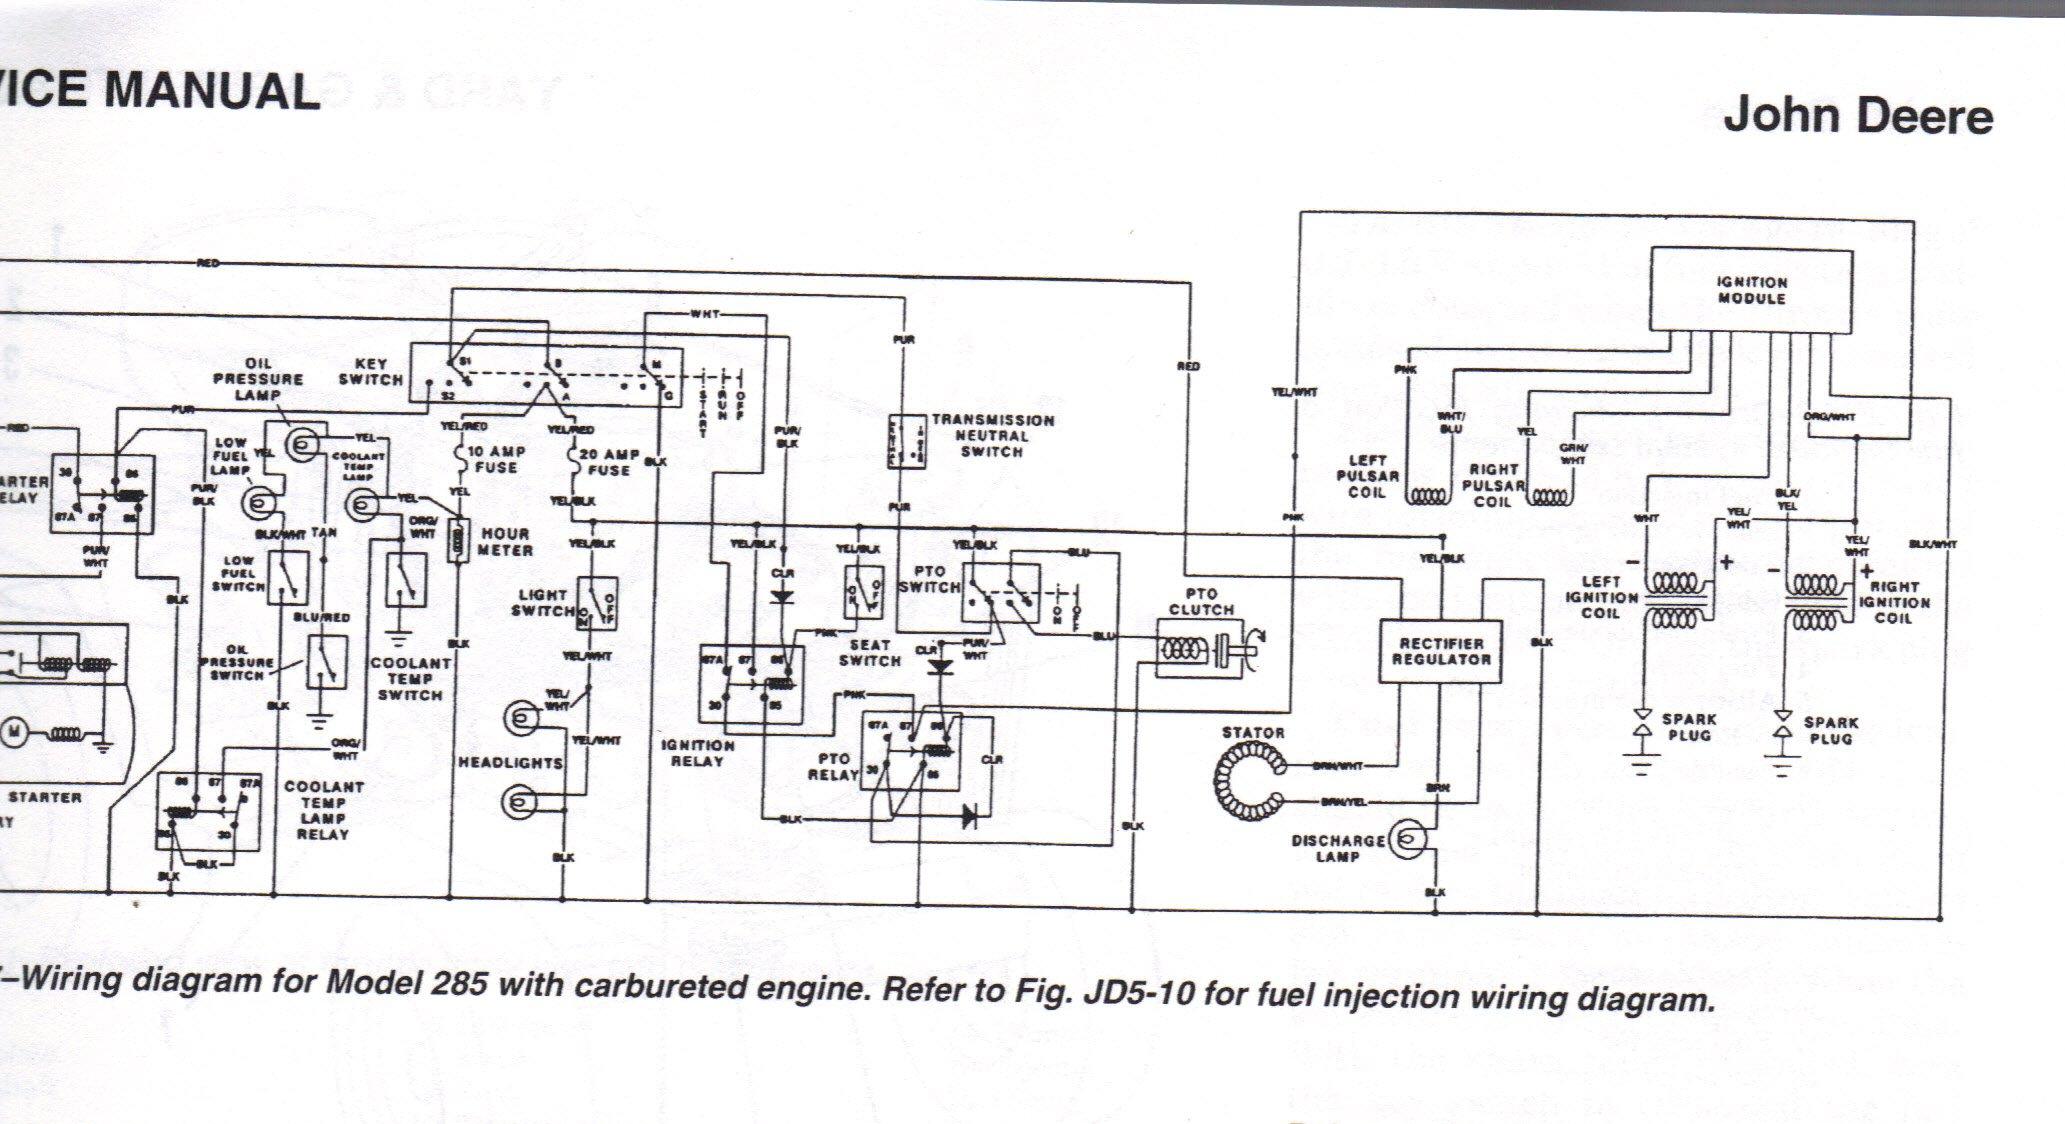 John Deere 175 Lawn Tractor Wiring Diagram, John, Free .